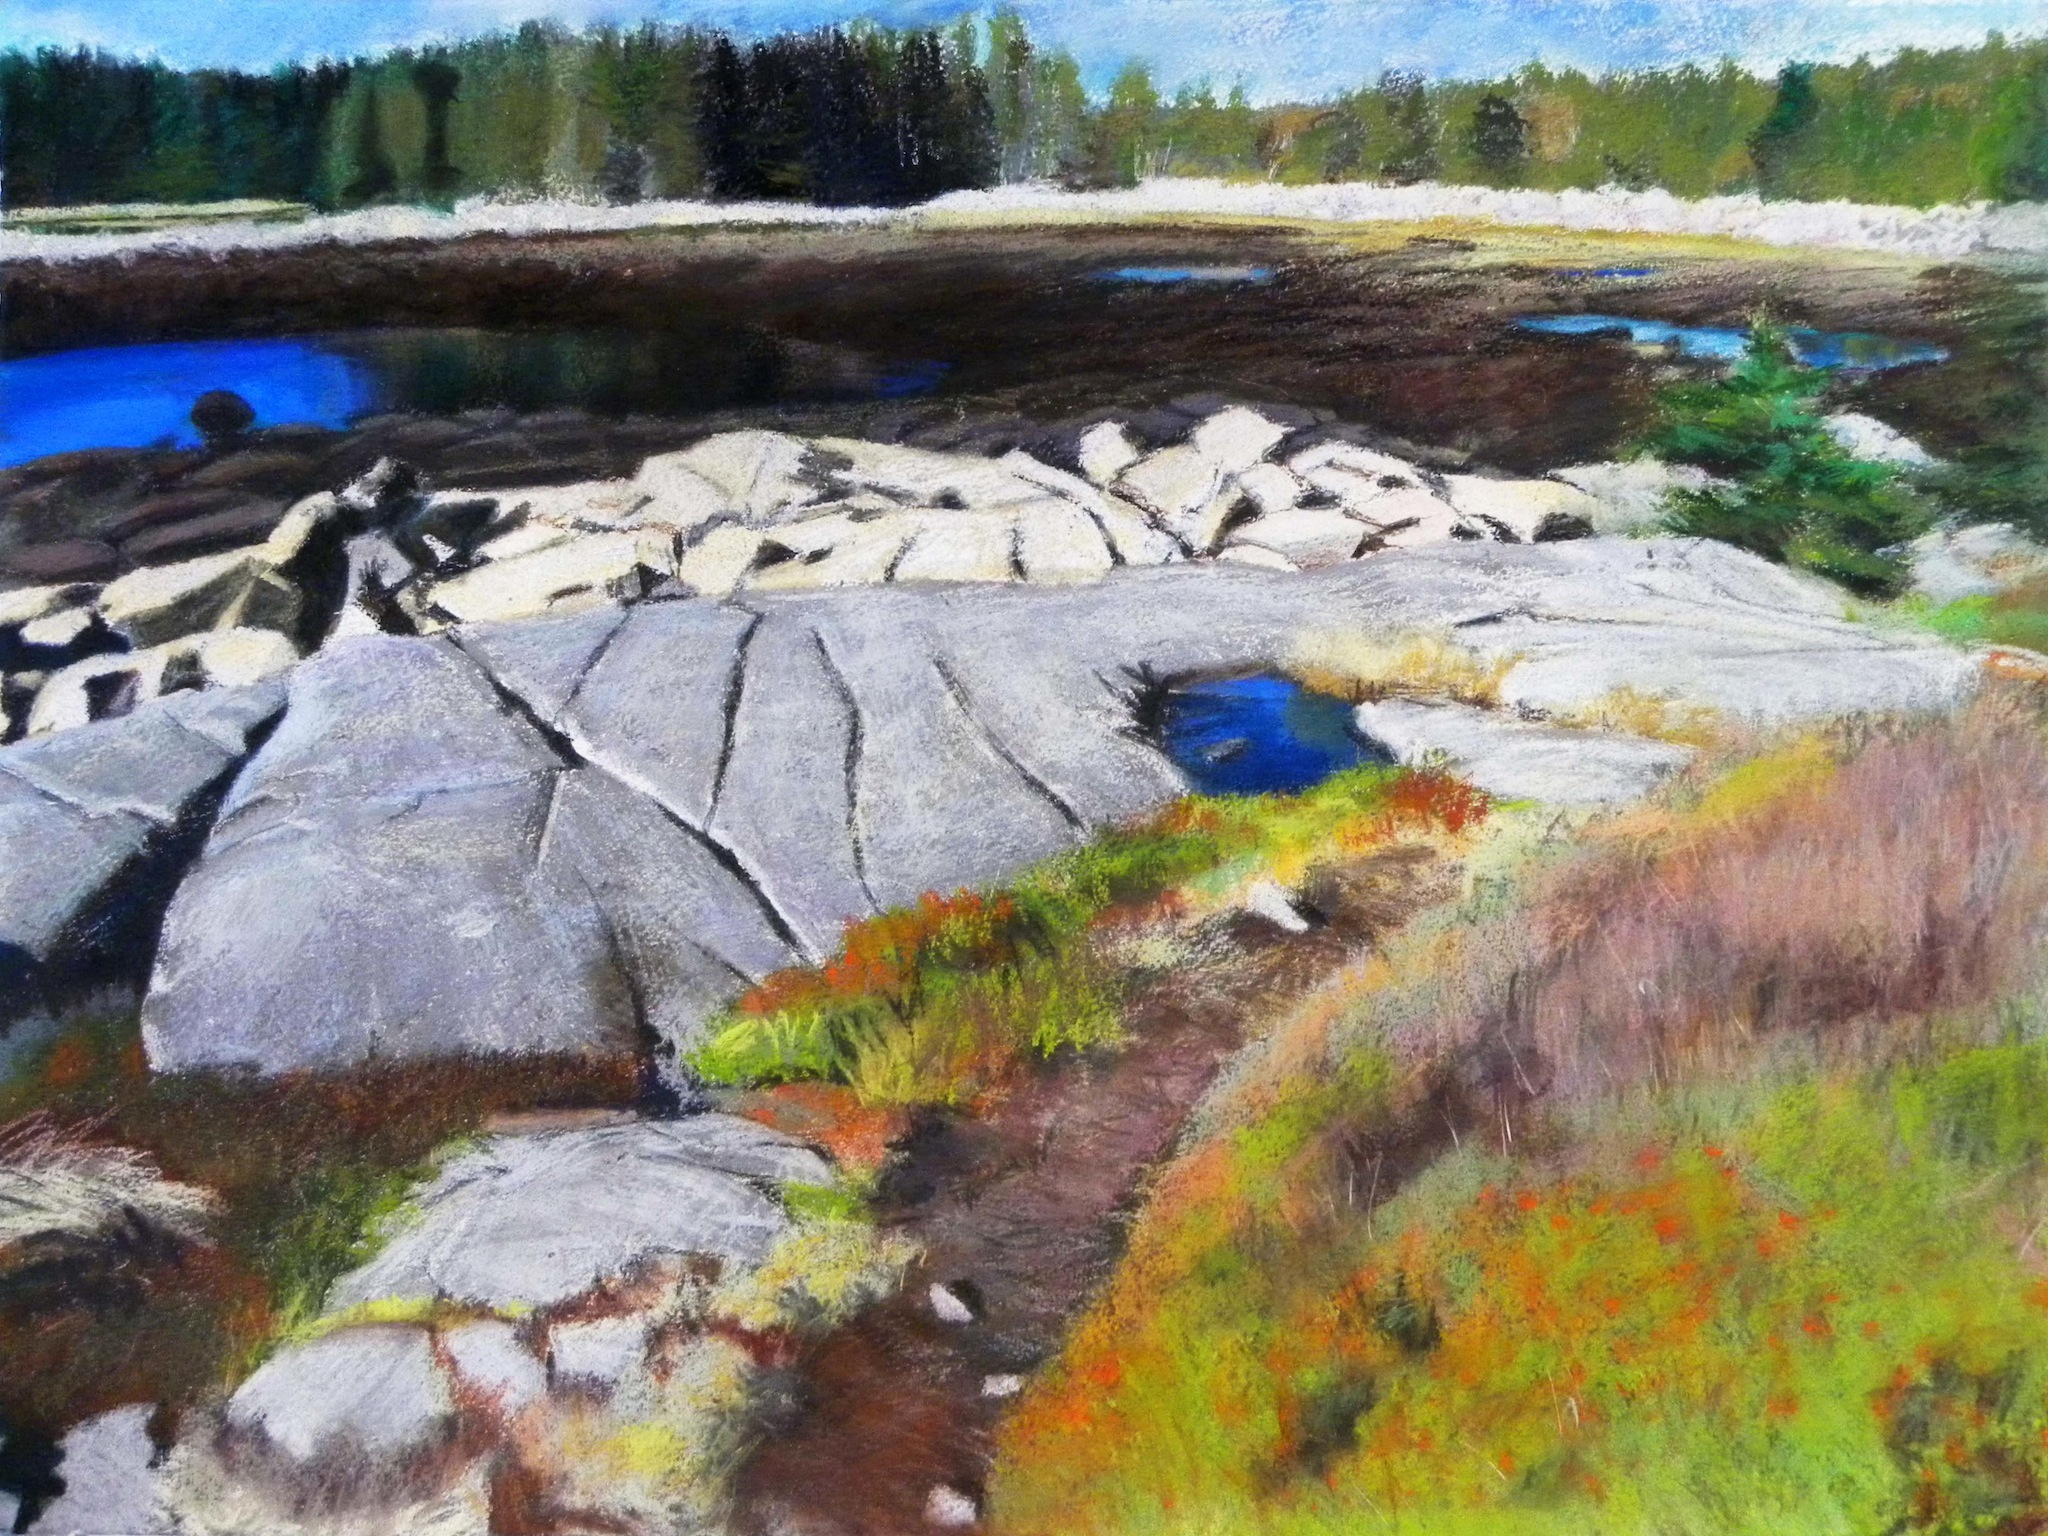 Little Moose Island 2